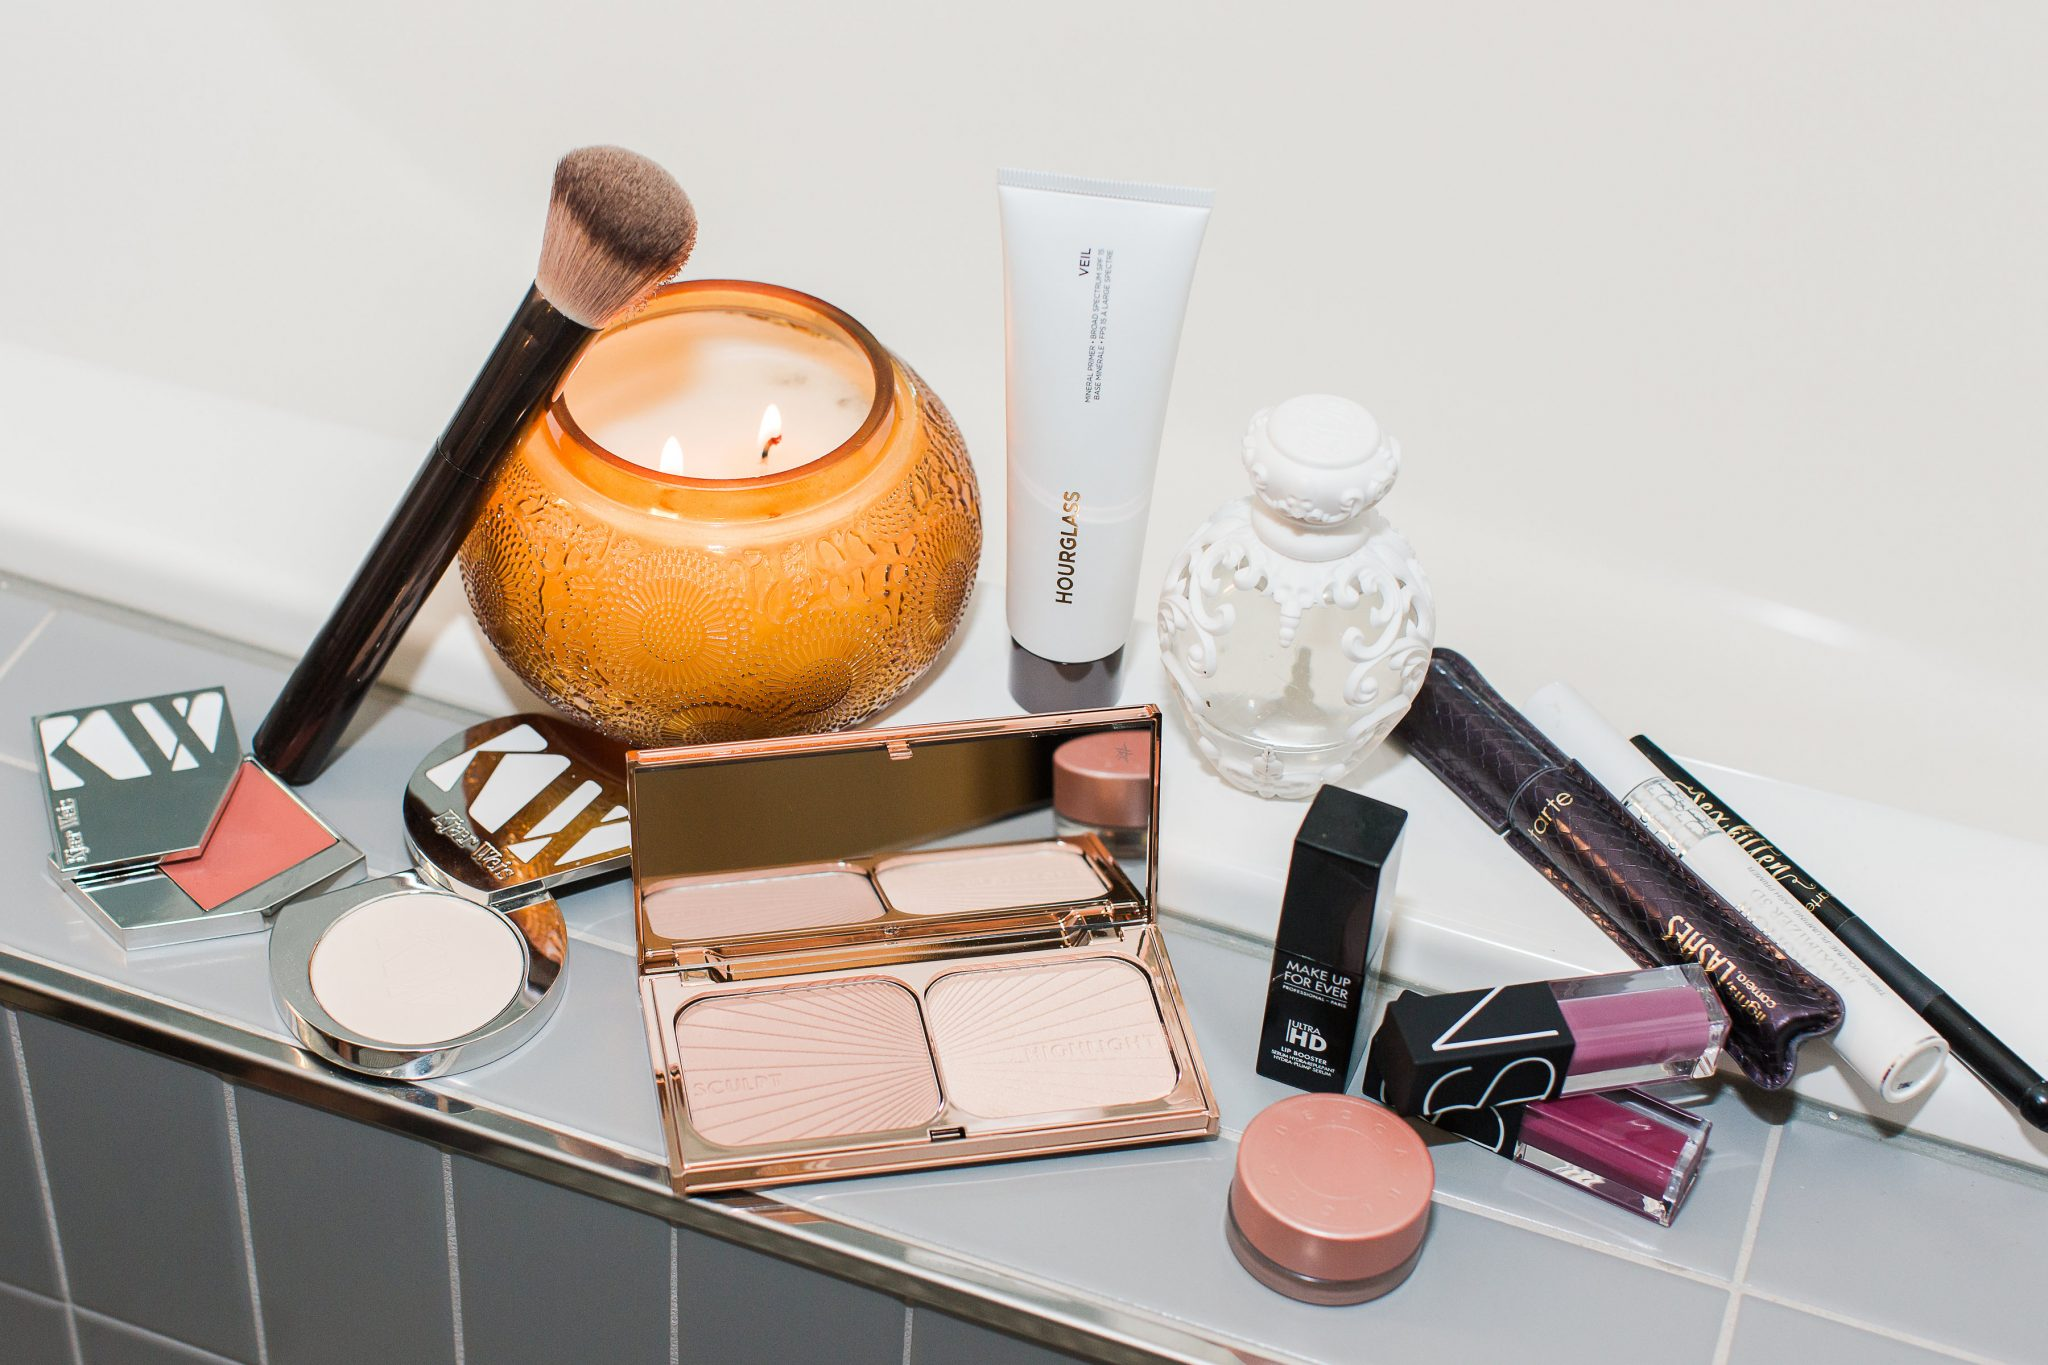 February Beauty Favorites by popular Orange County beauty blogger Maxie Elise